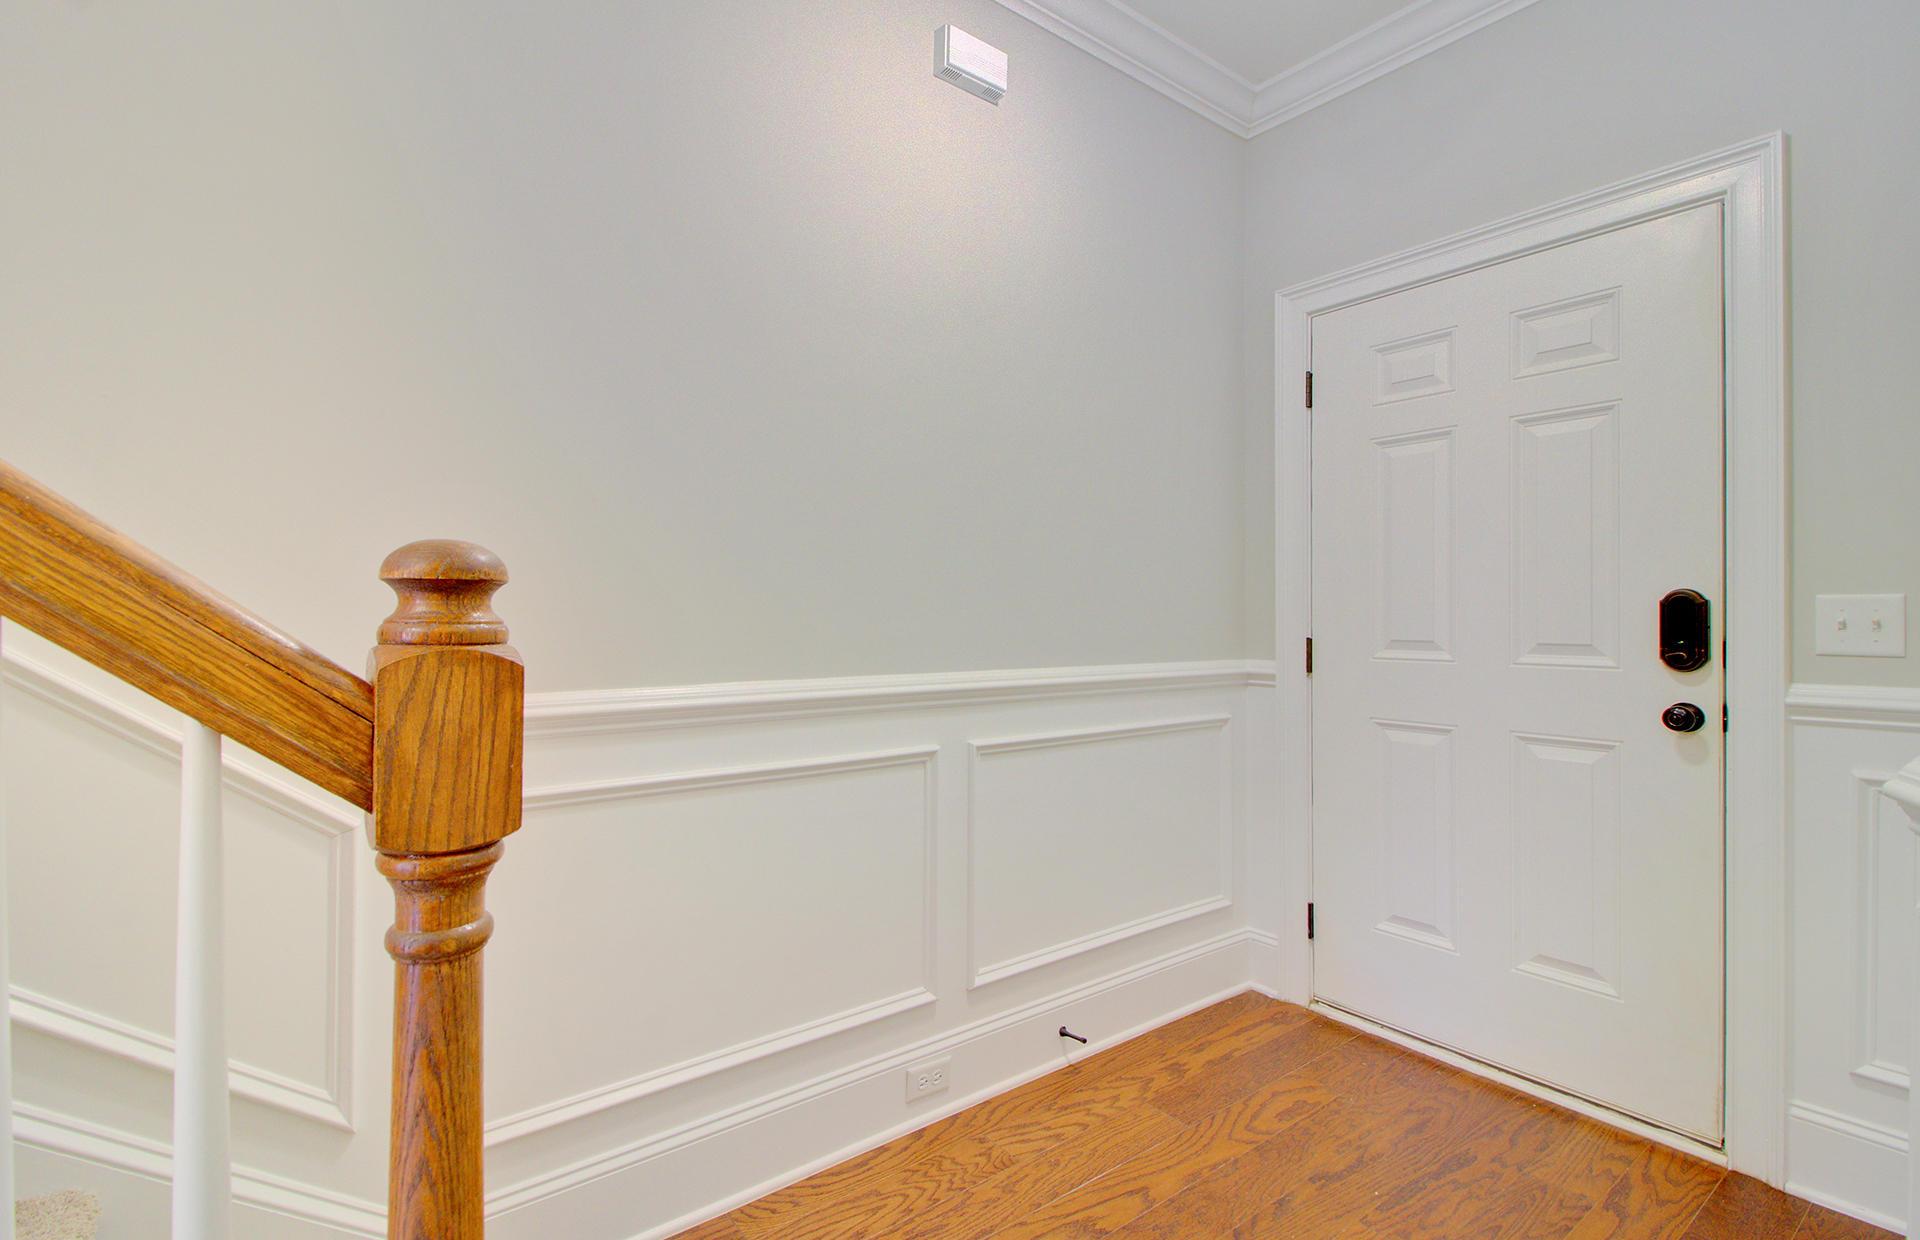 Carol Oaks Town Homes Homes For Sale - 2960 Emma, Mount Pleasant, SC - 2